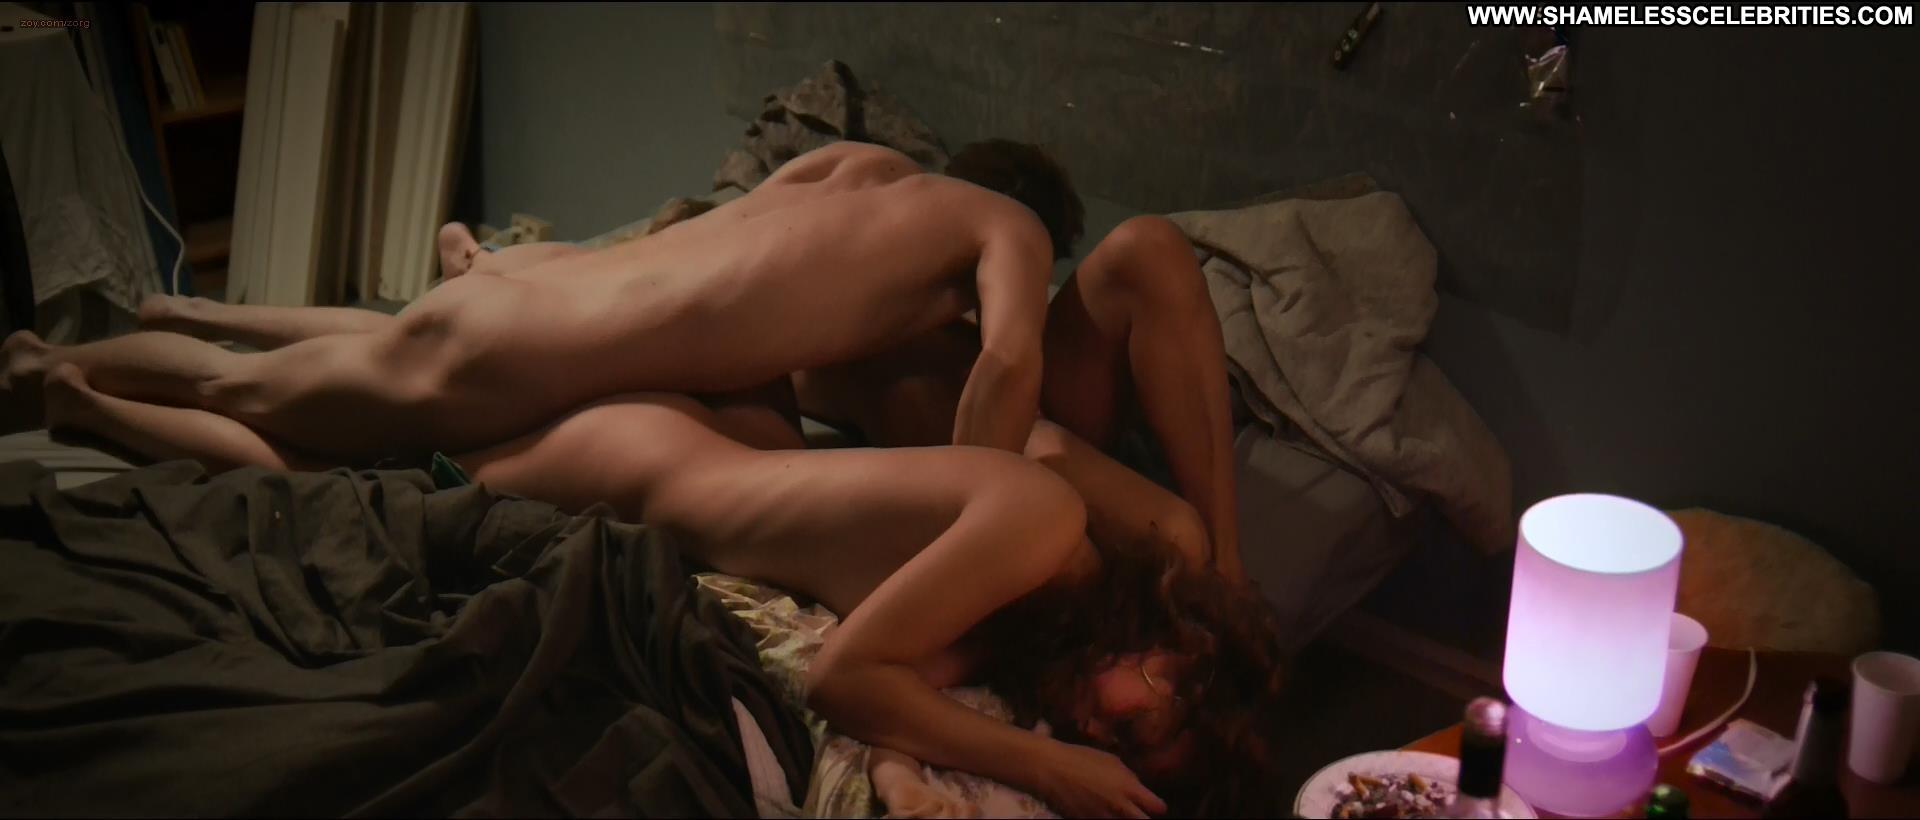 movie sex scenes threesomes